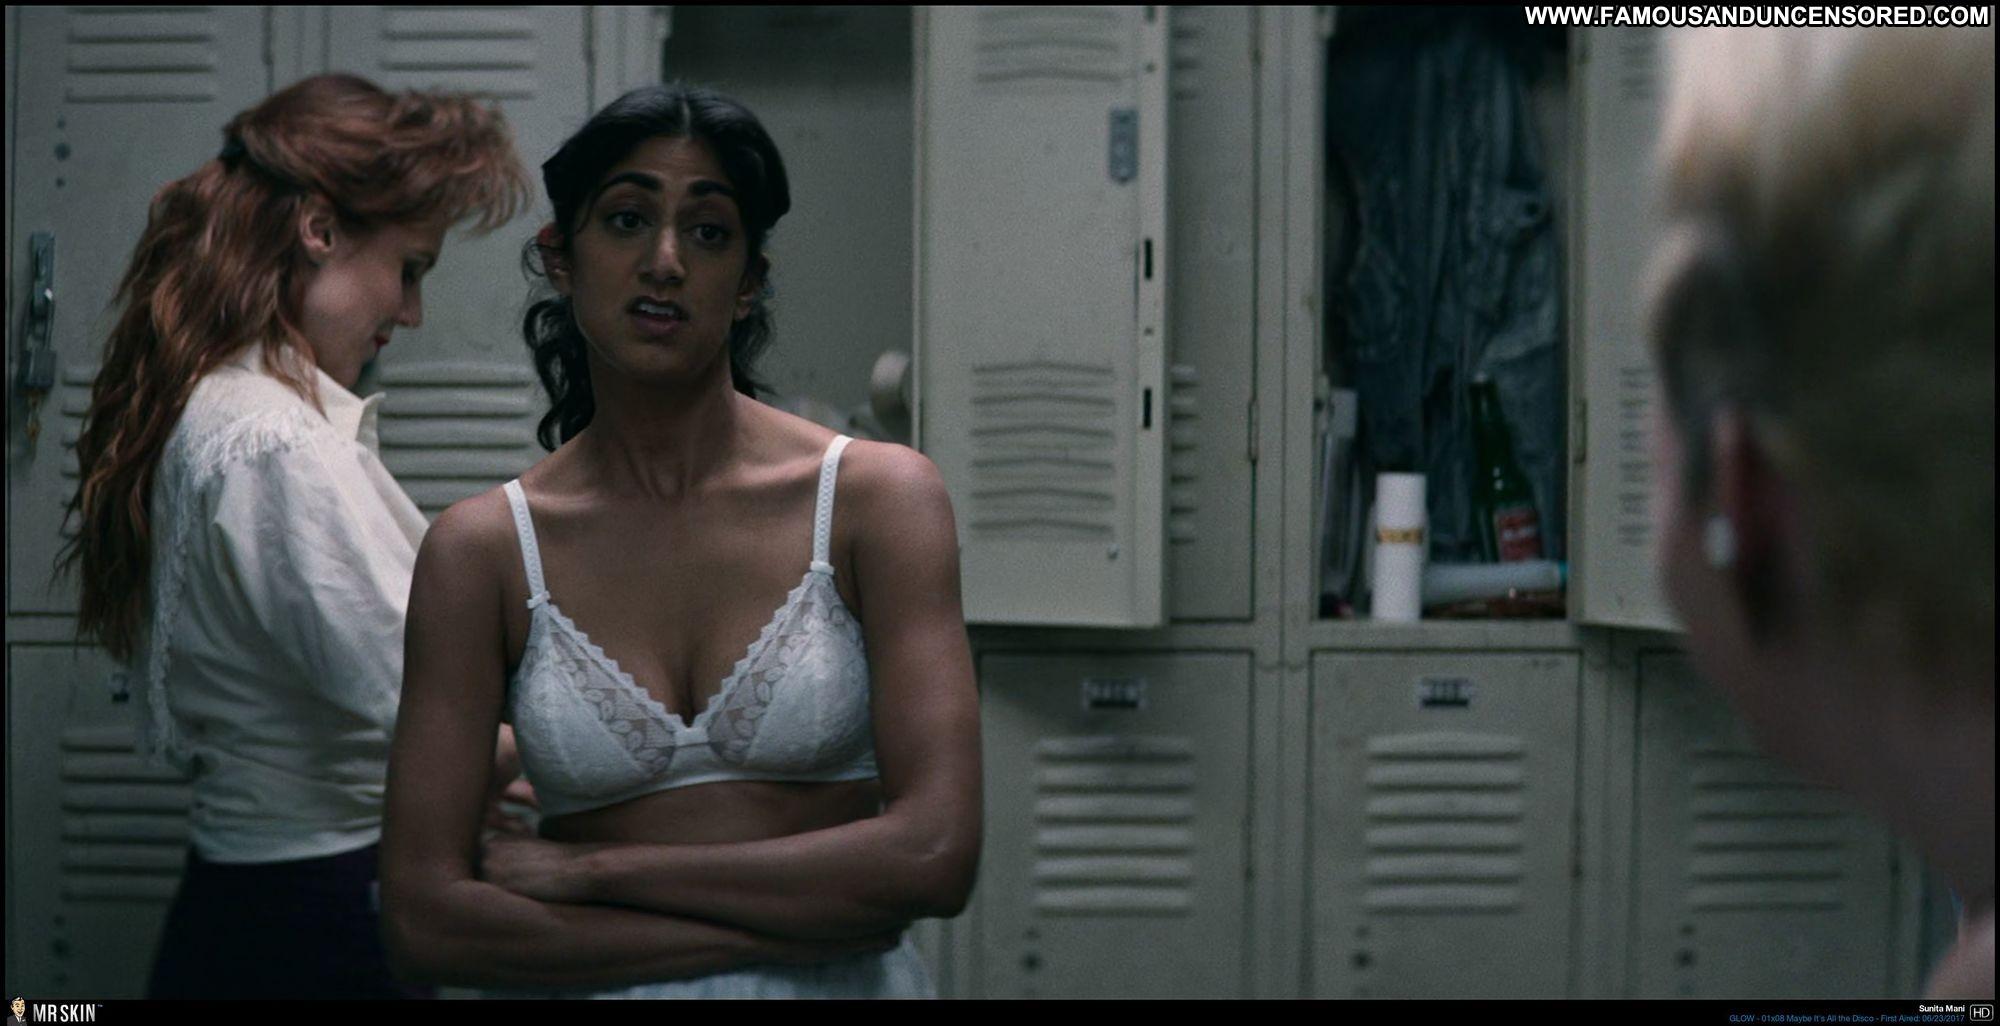 Sunita Mani Glow Glow Celebrity Posing Hot Beautiful Babe